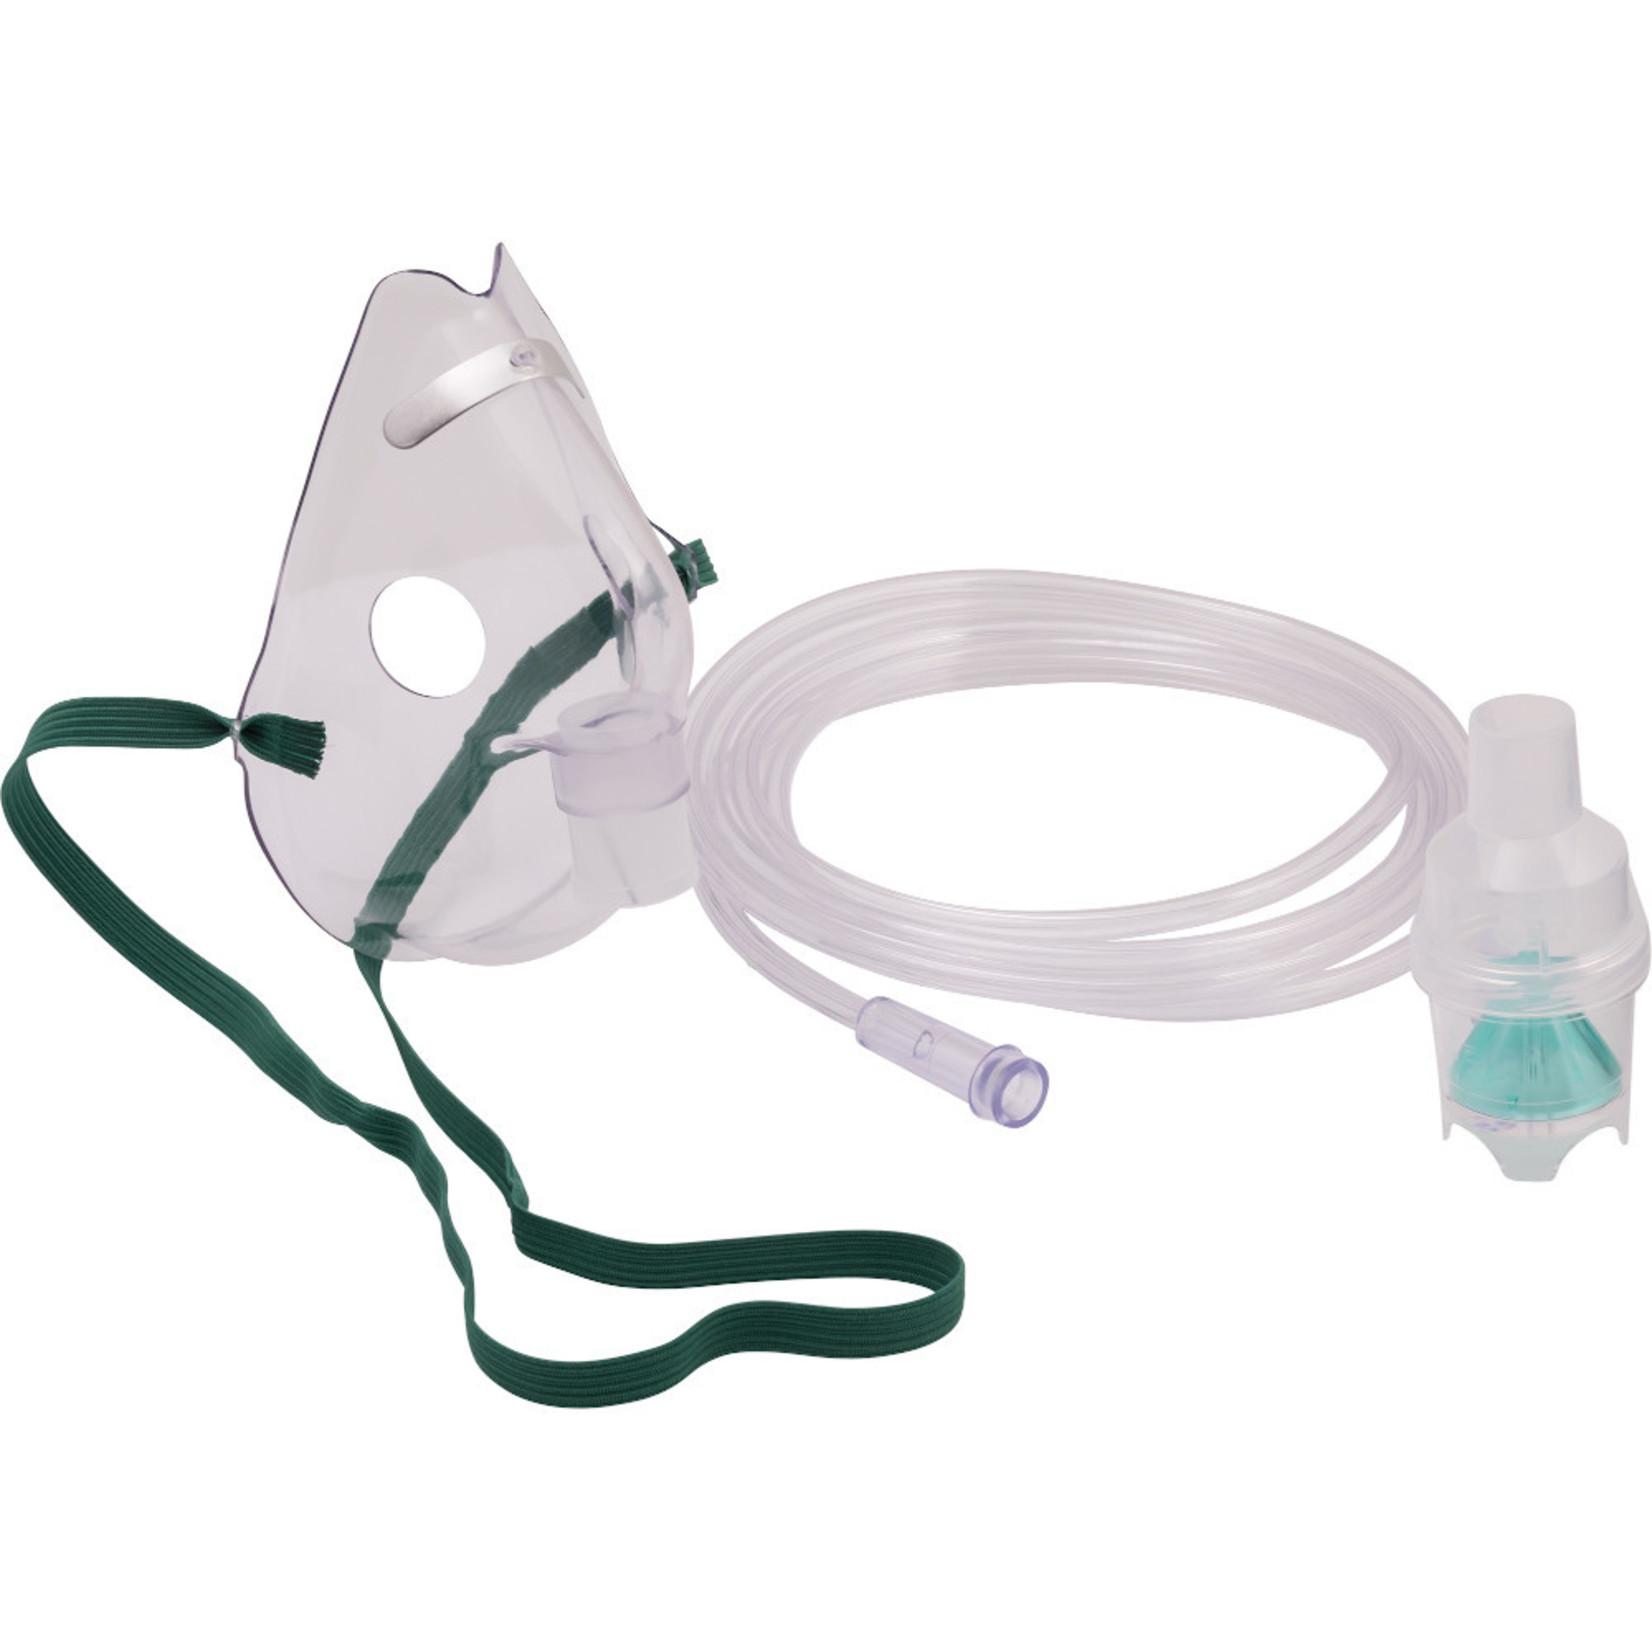 Nebulizer Mask - Adult